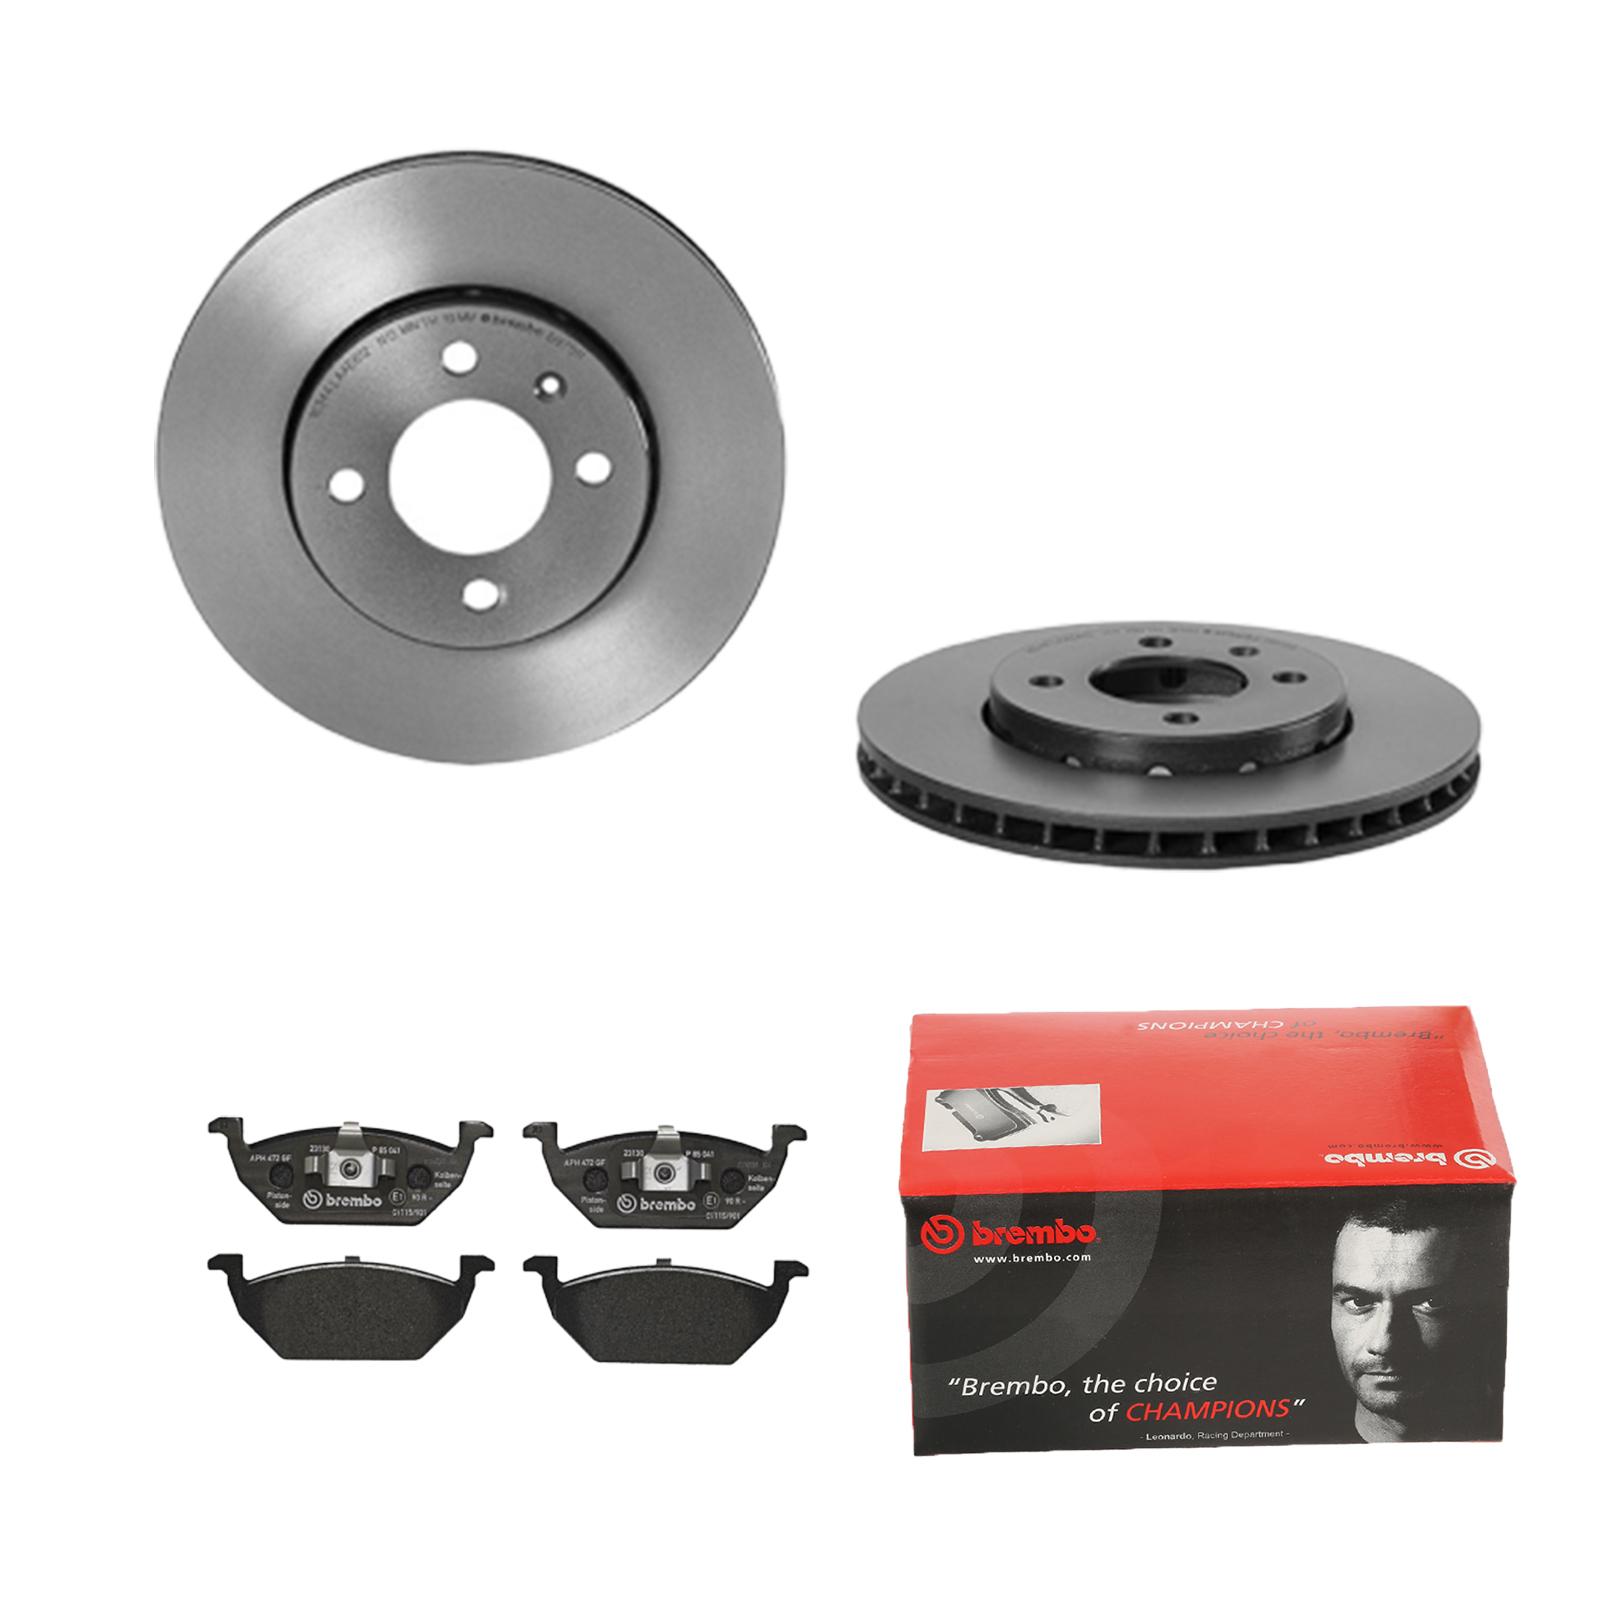 Bremsbeläge Hinten Brembo2 Bremsscheiben COATED DISC LINE Belüftet Ø 330 mm